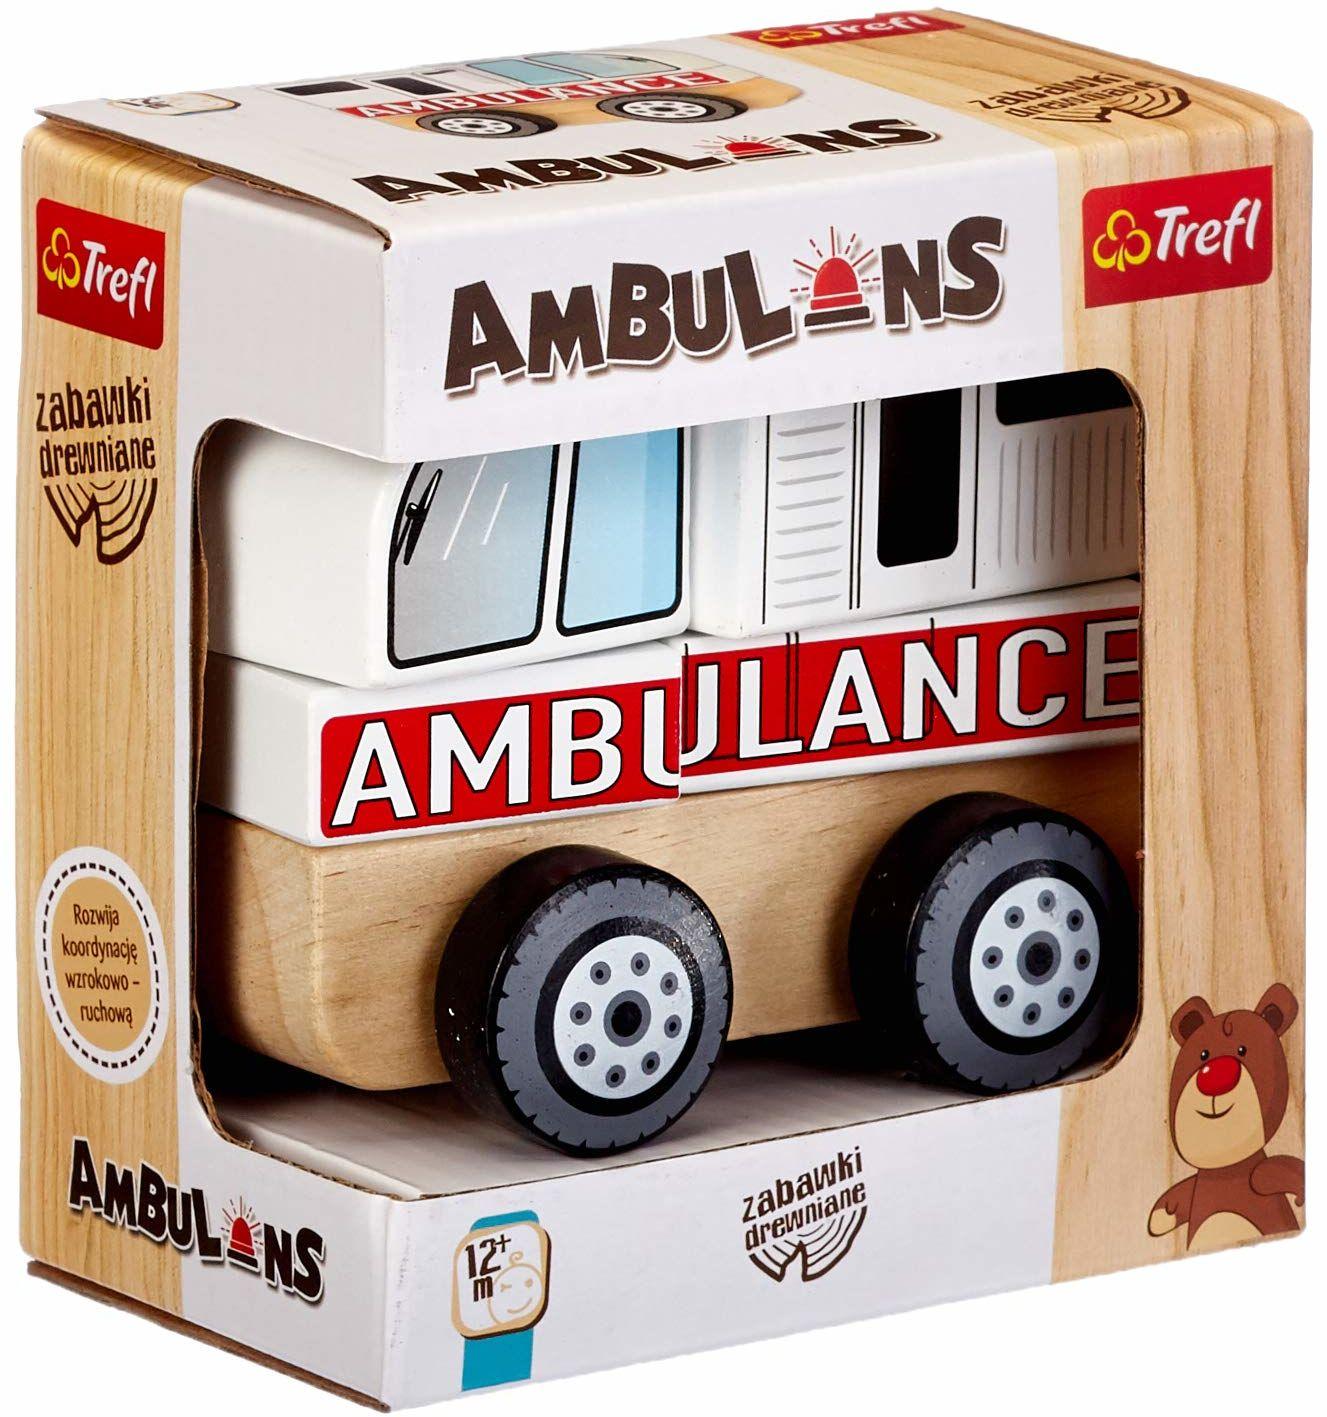 Trefl 61000,Zabawka Drewniana, Ambulans 61000